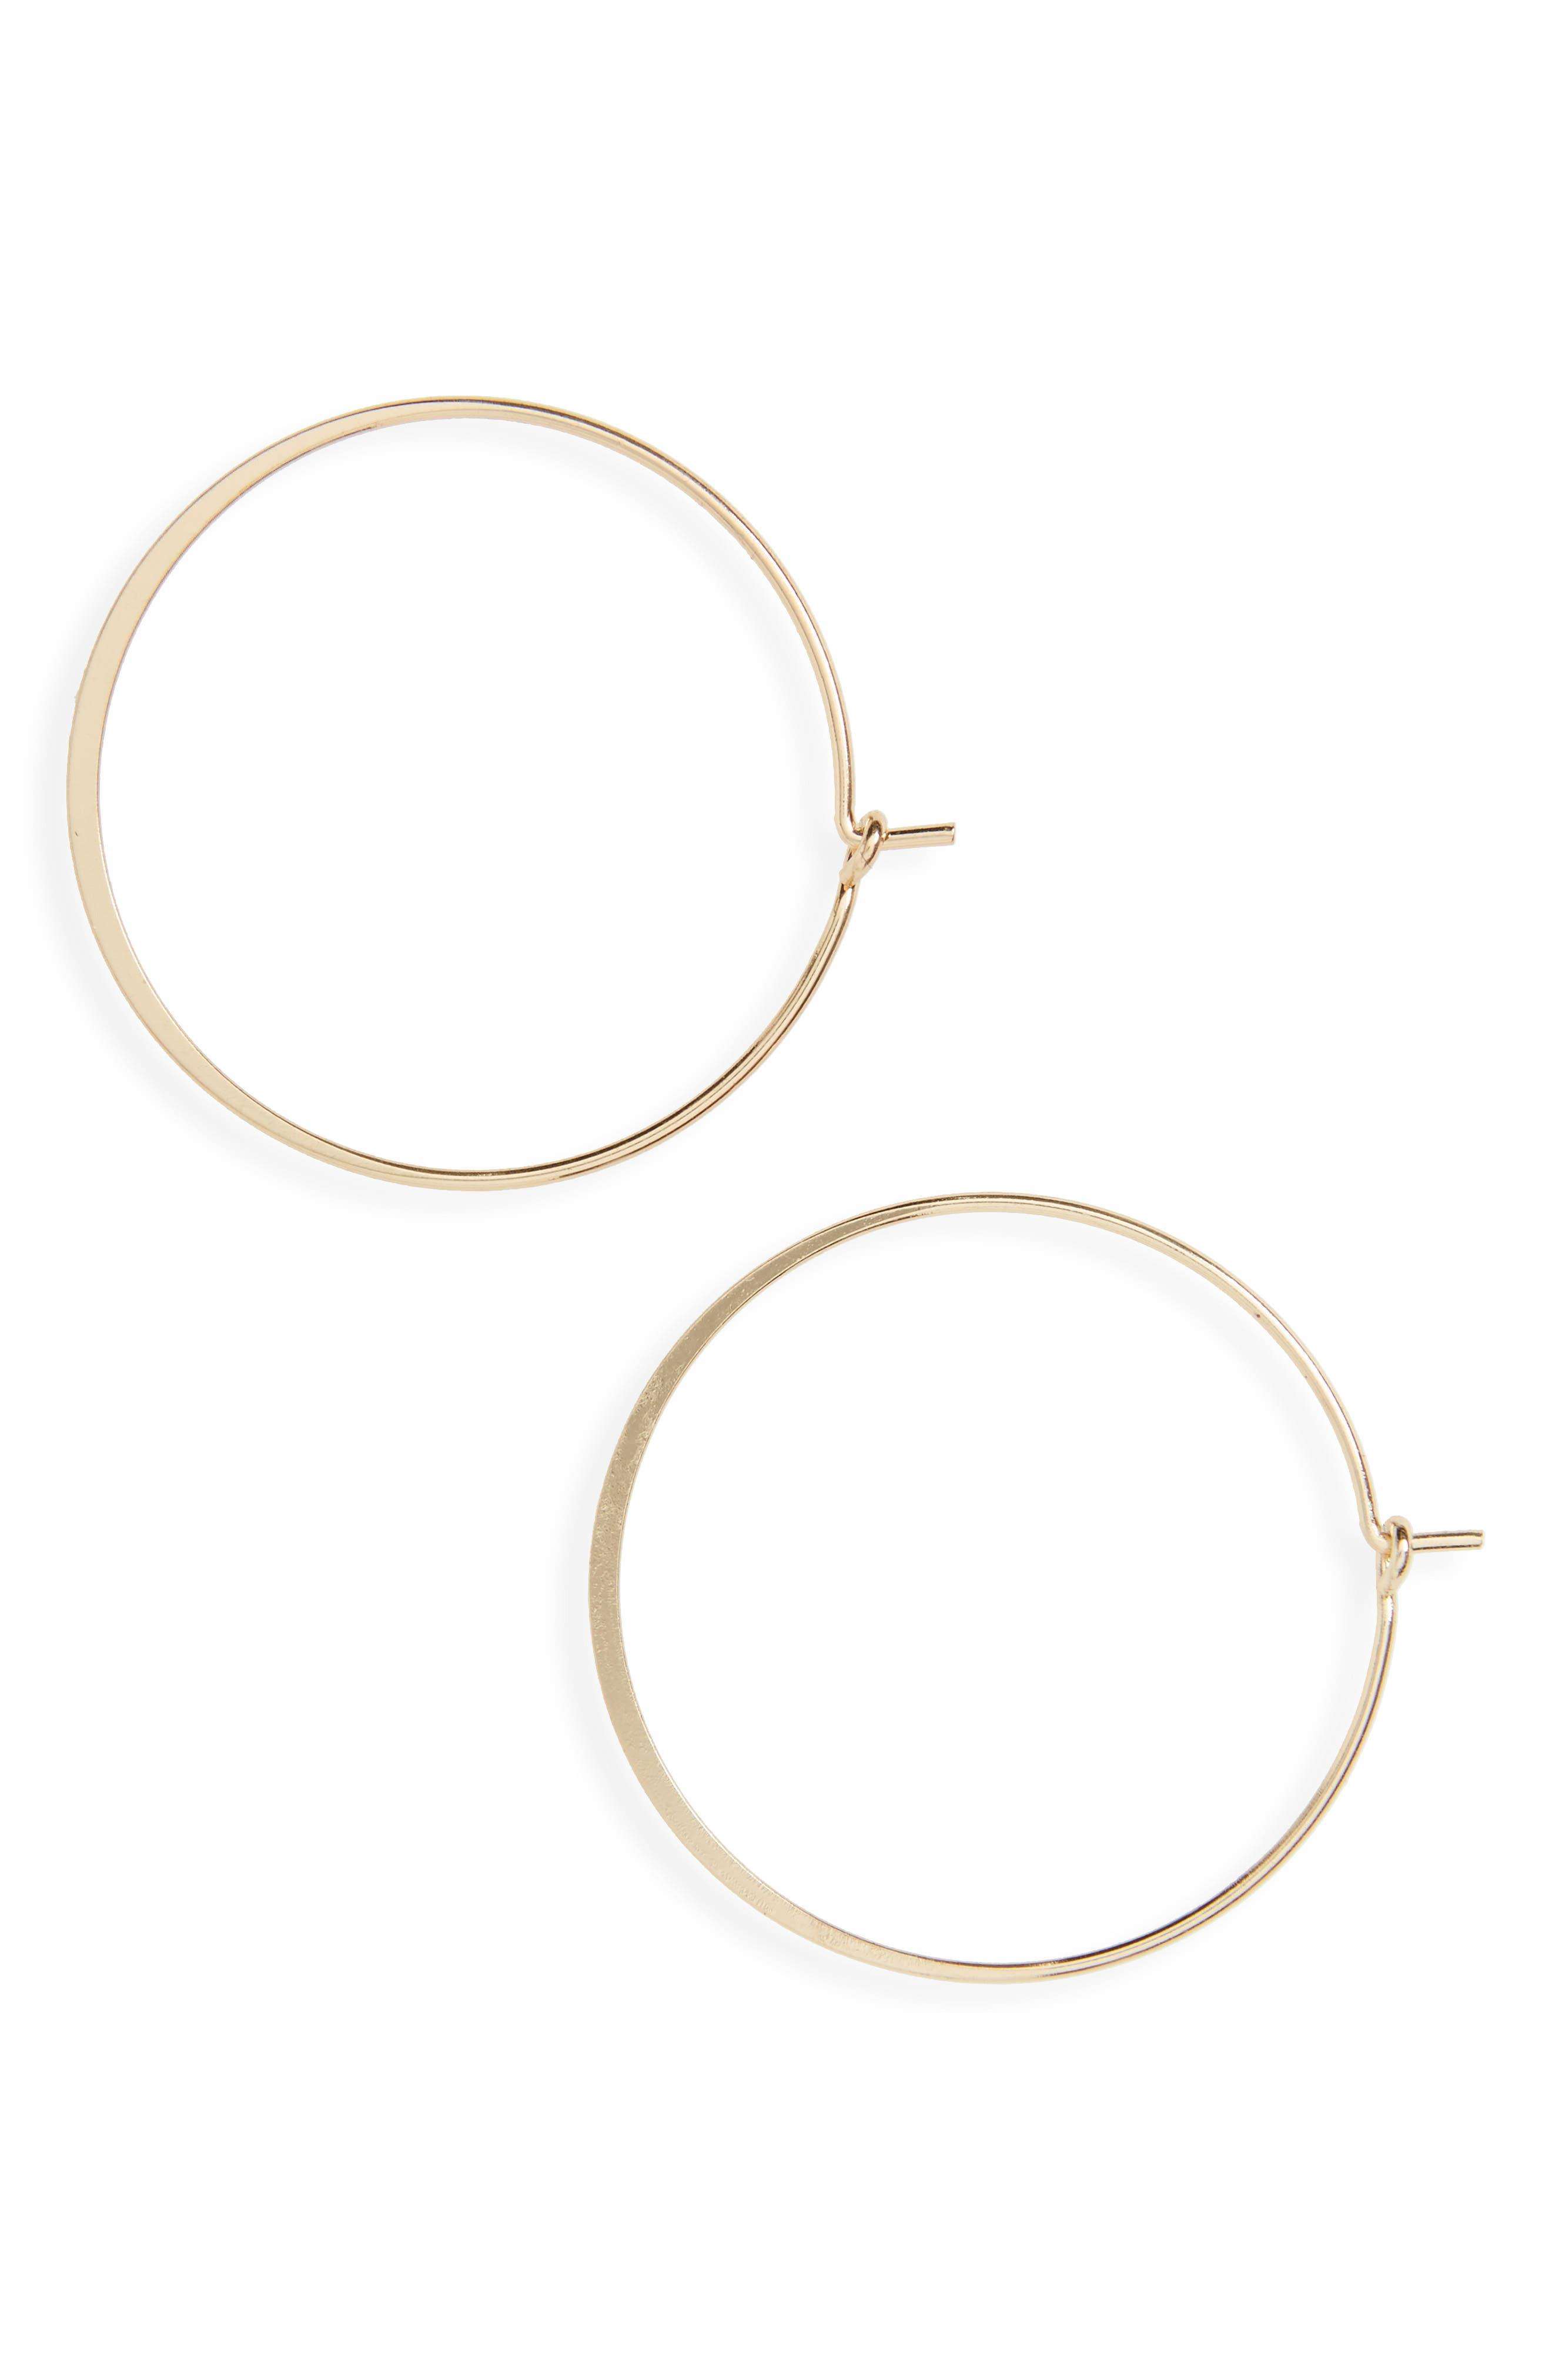 Flat Hoop Earrings,                             Main thumbnail 1, color,                             Gold